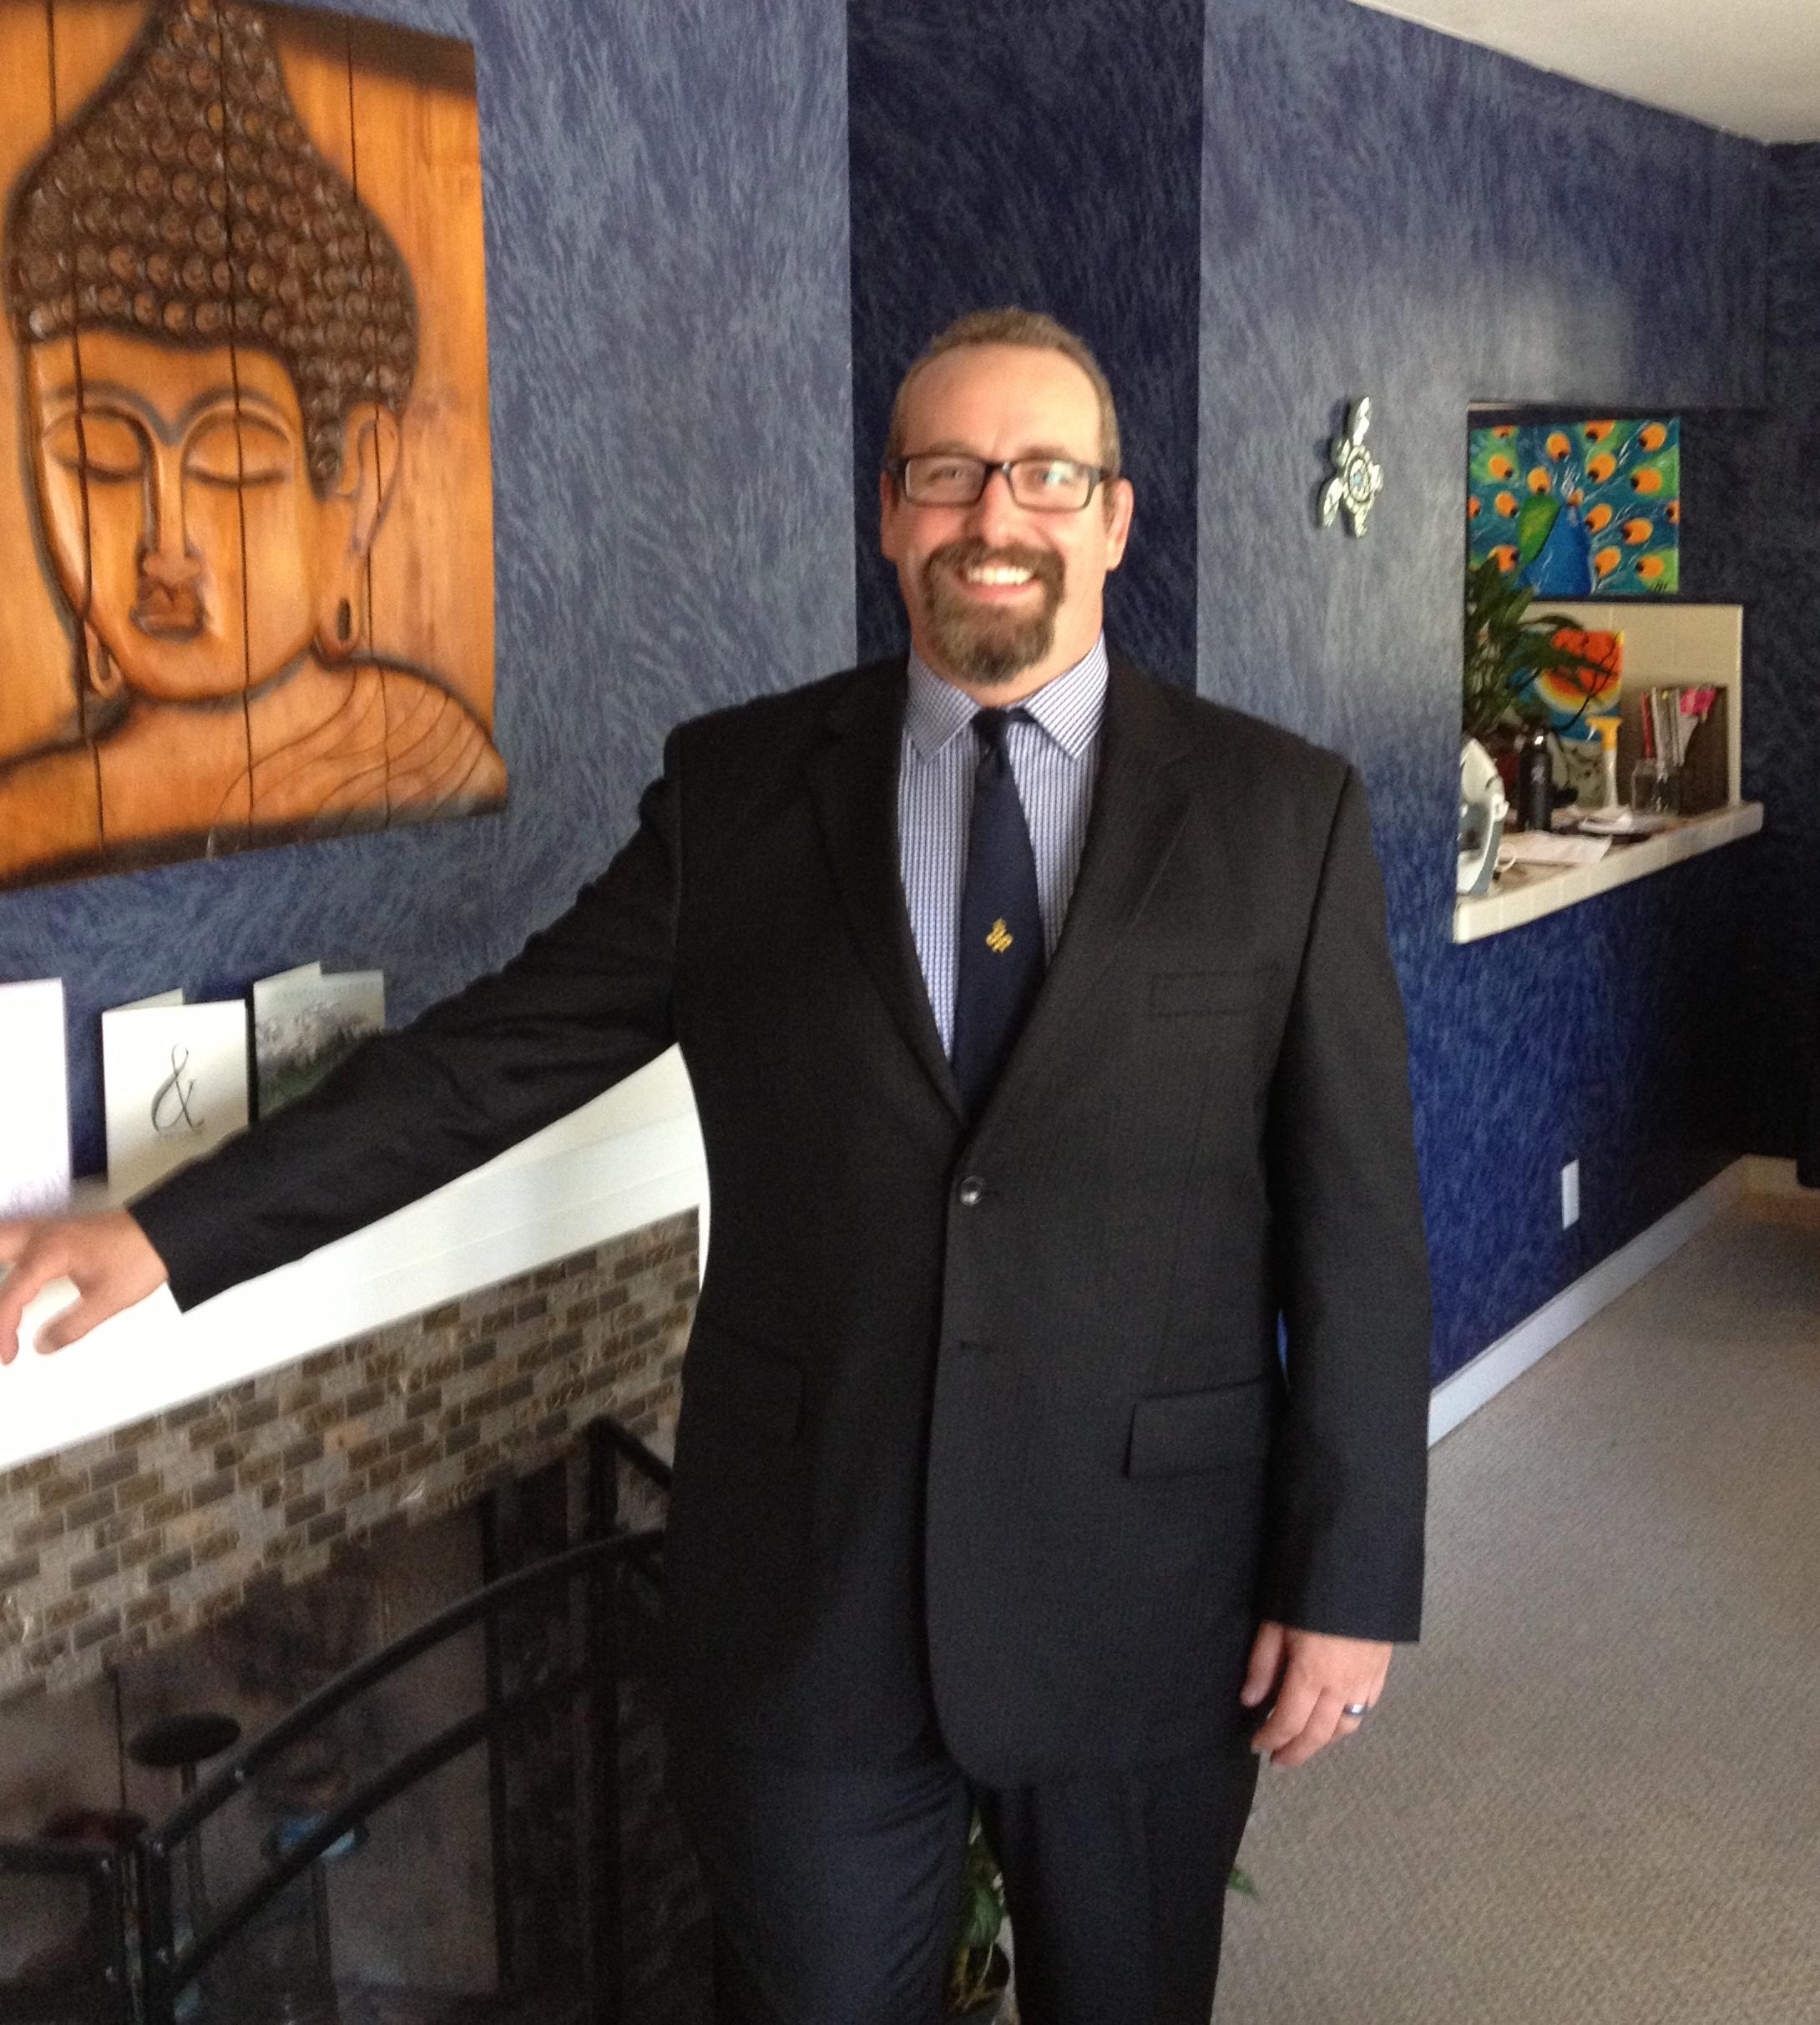 Michael Hurley, Einstein Medical National Sales Director